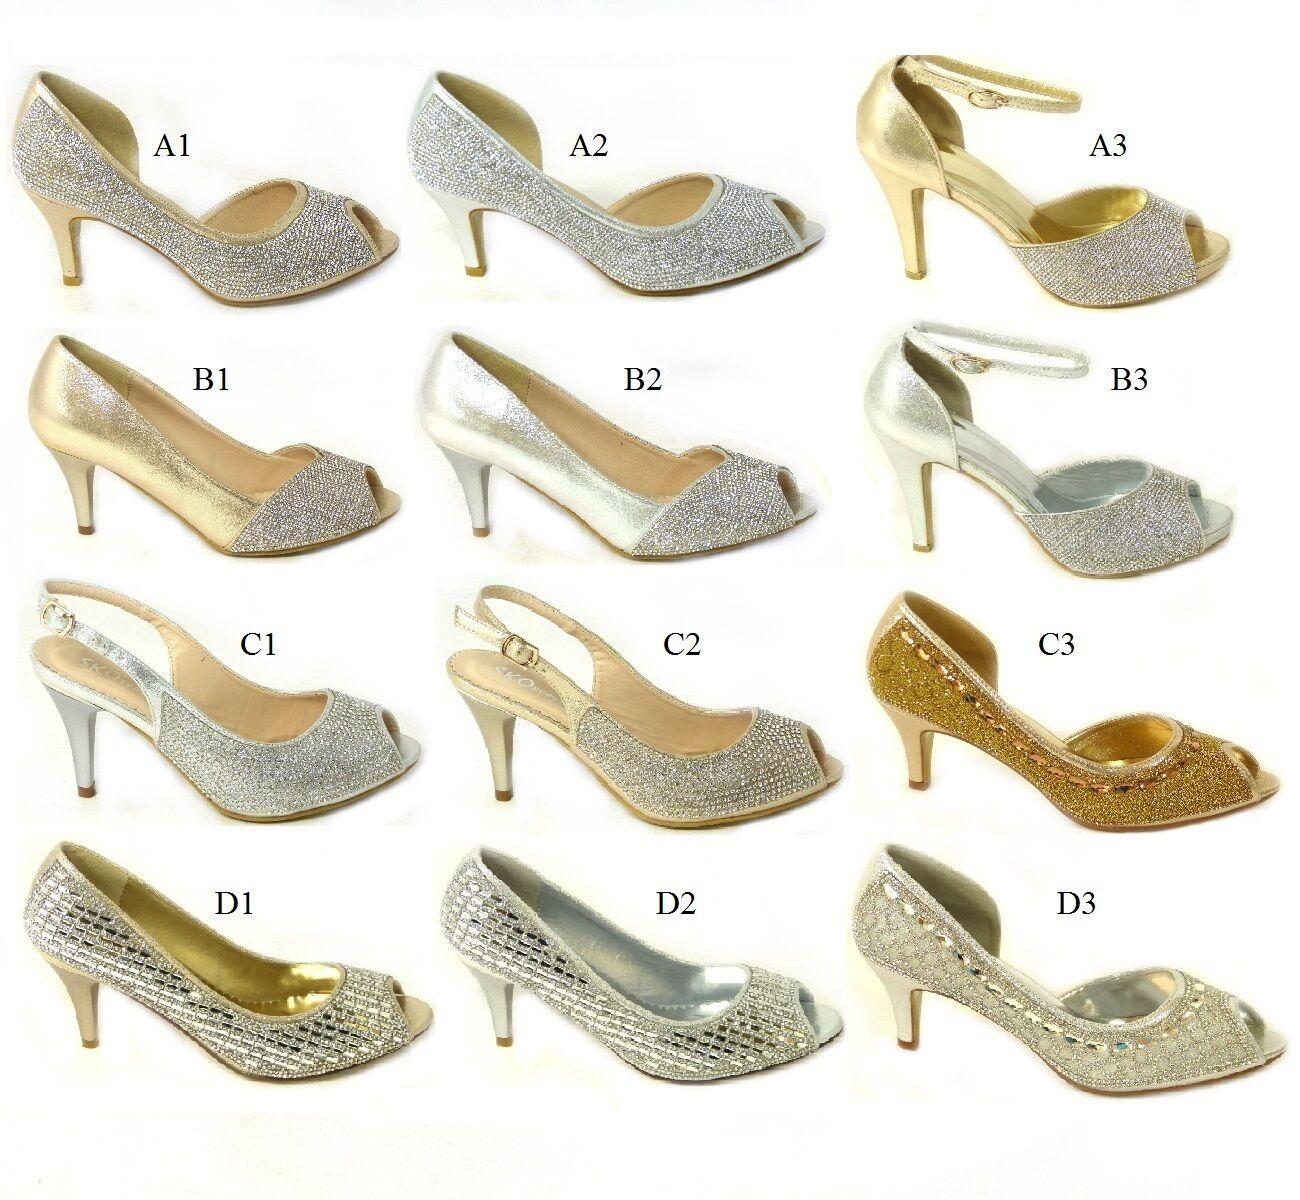 Ladies Womens Slip On High Block Heel Sandals Peep Toe Diamante Wedding Shoes